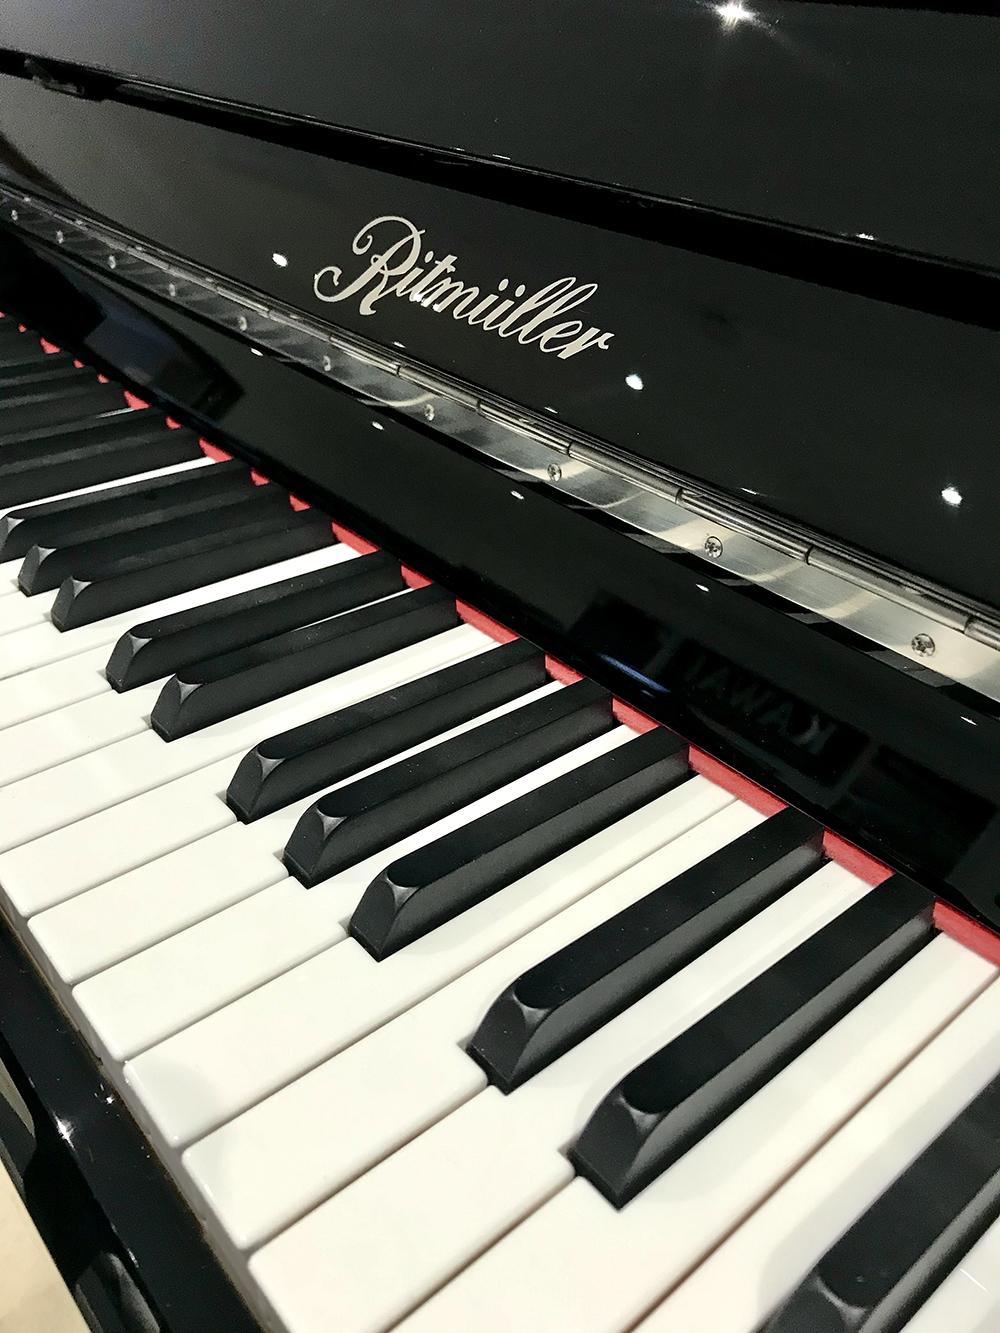 ritmuller-121-academy-Piano-Dorset-1.jpg